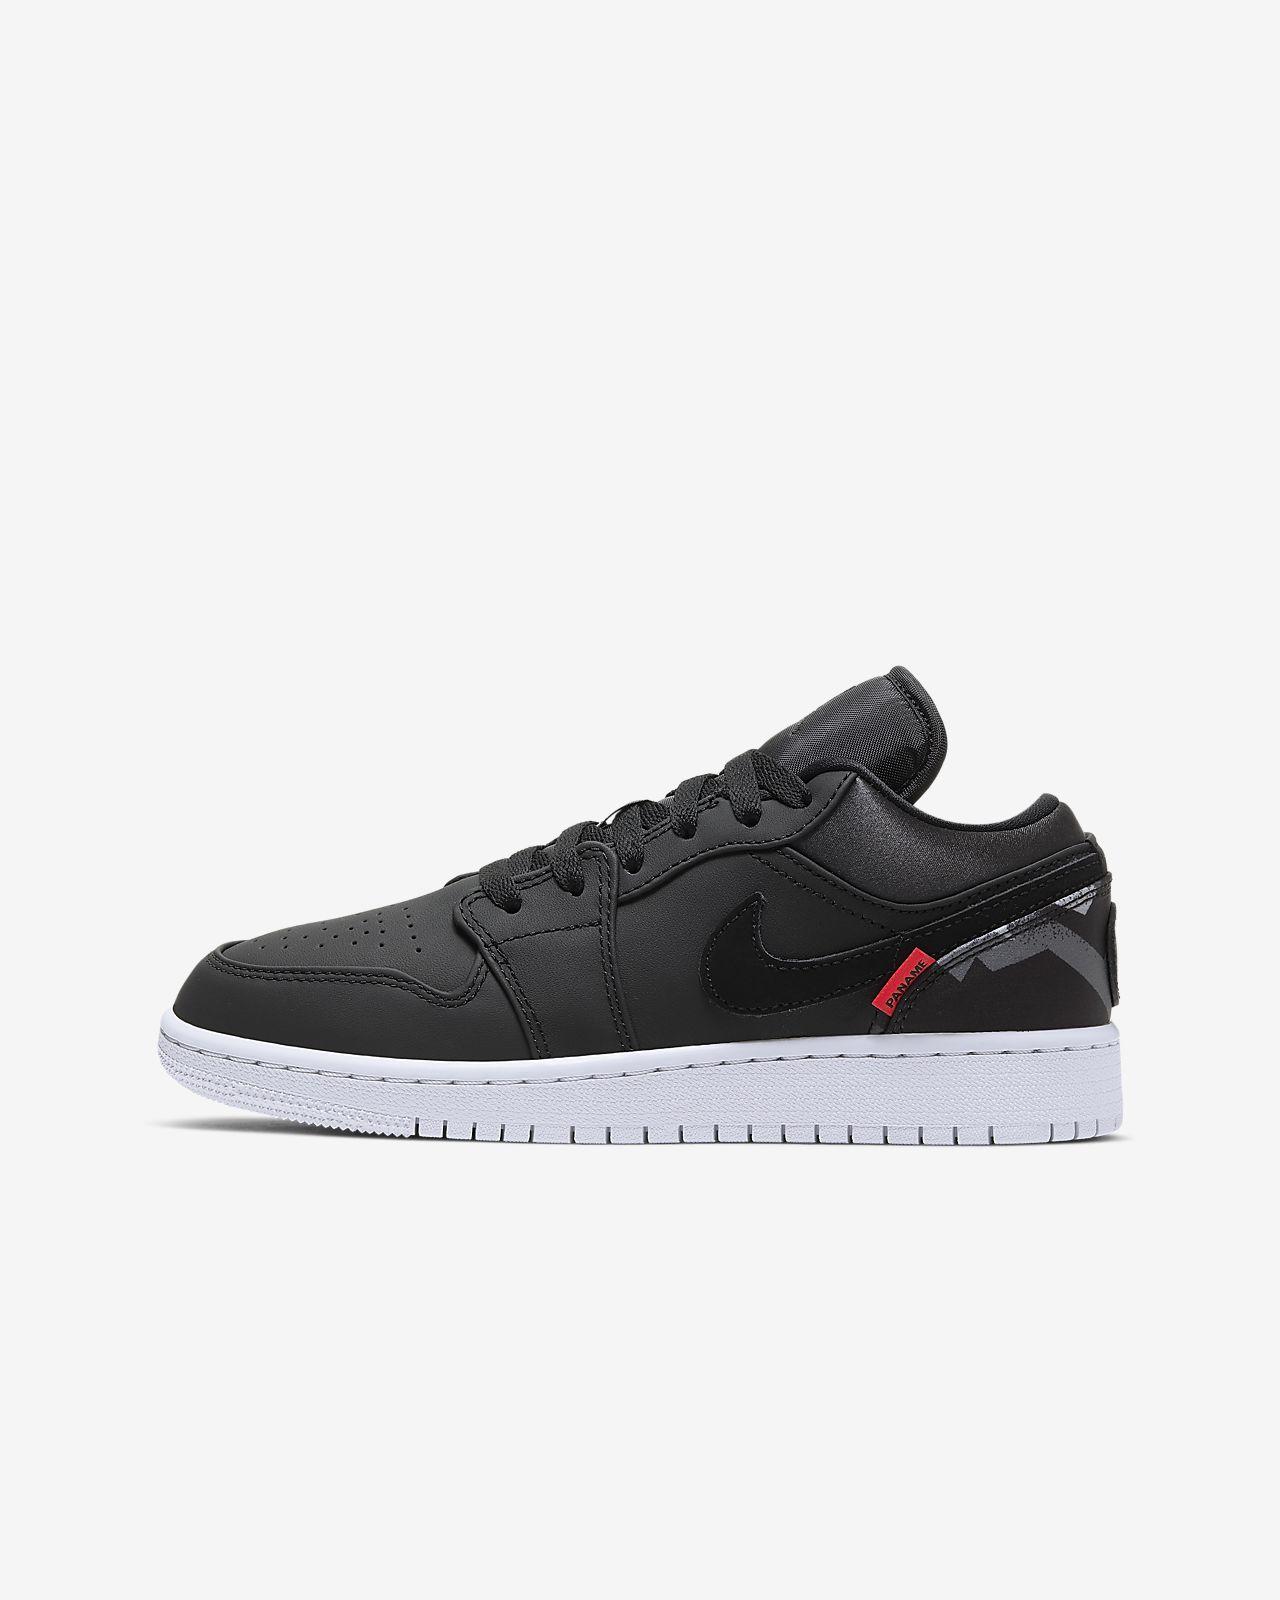 Air Jordan 1 Low Paris Saint-Germain Schuh für ältere Kinder